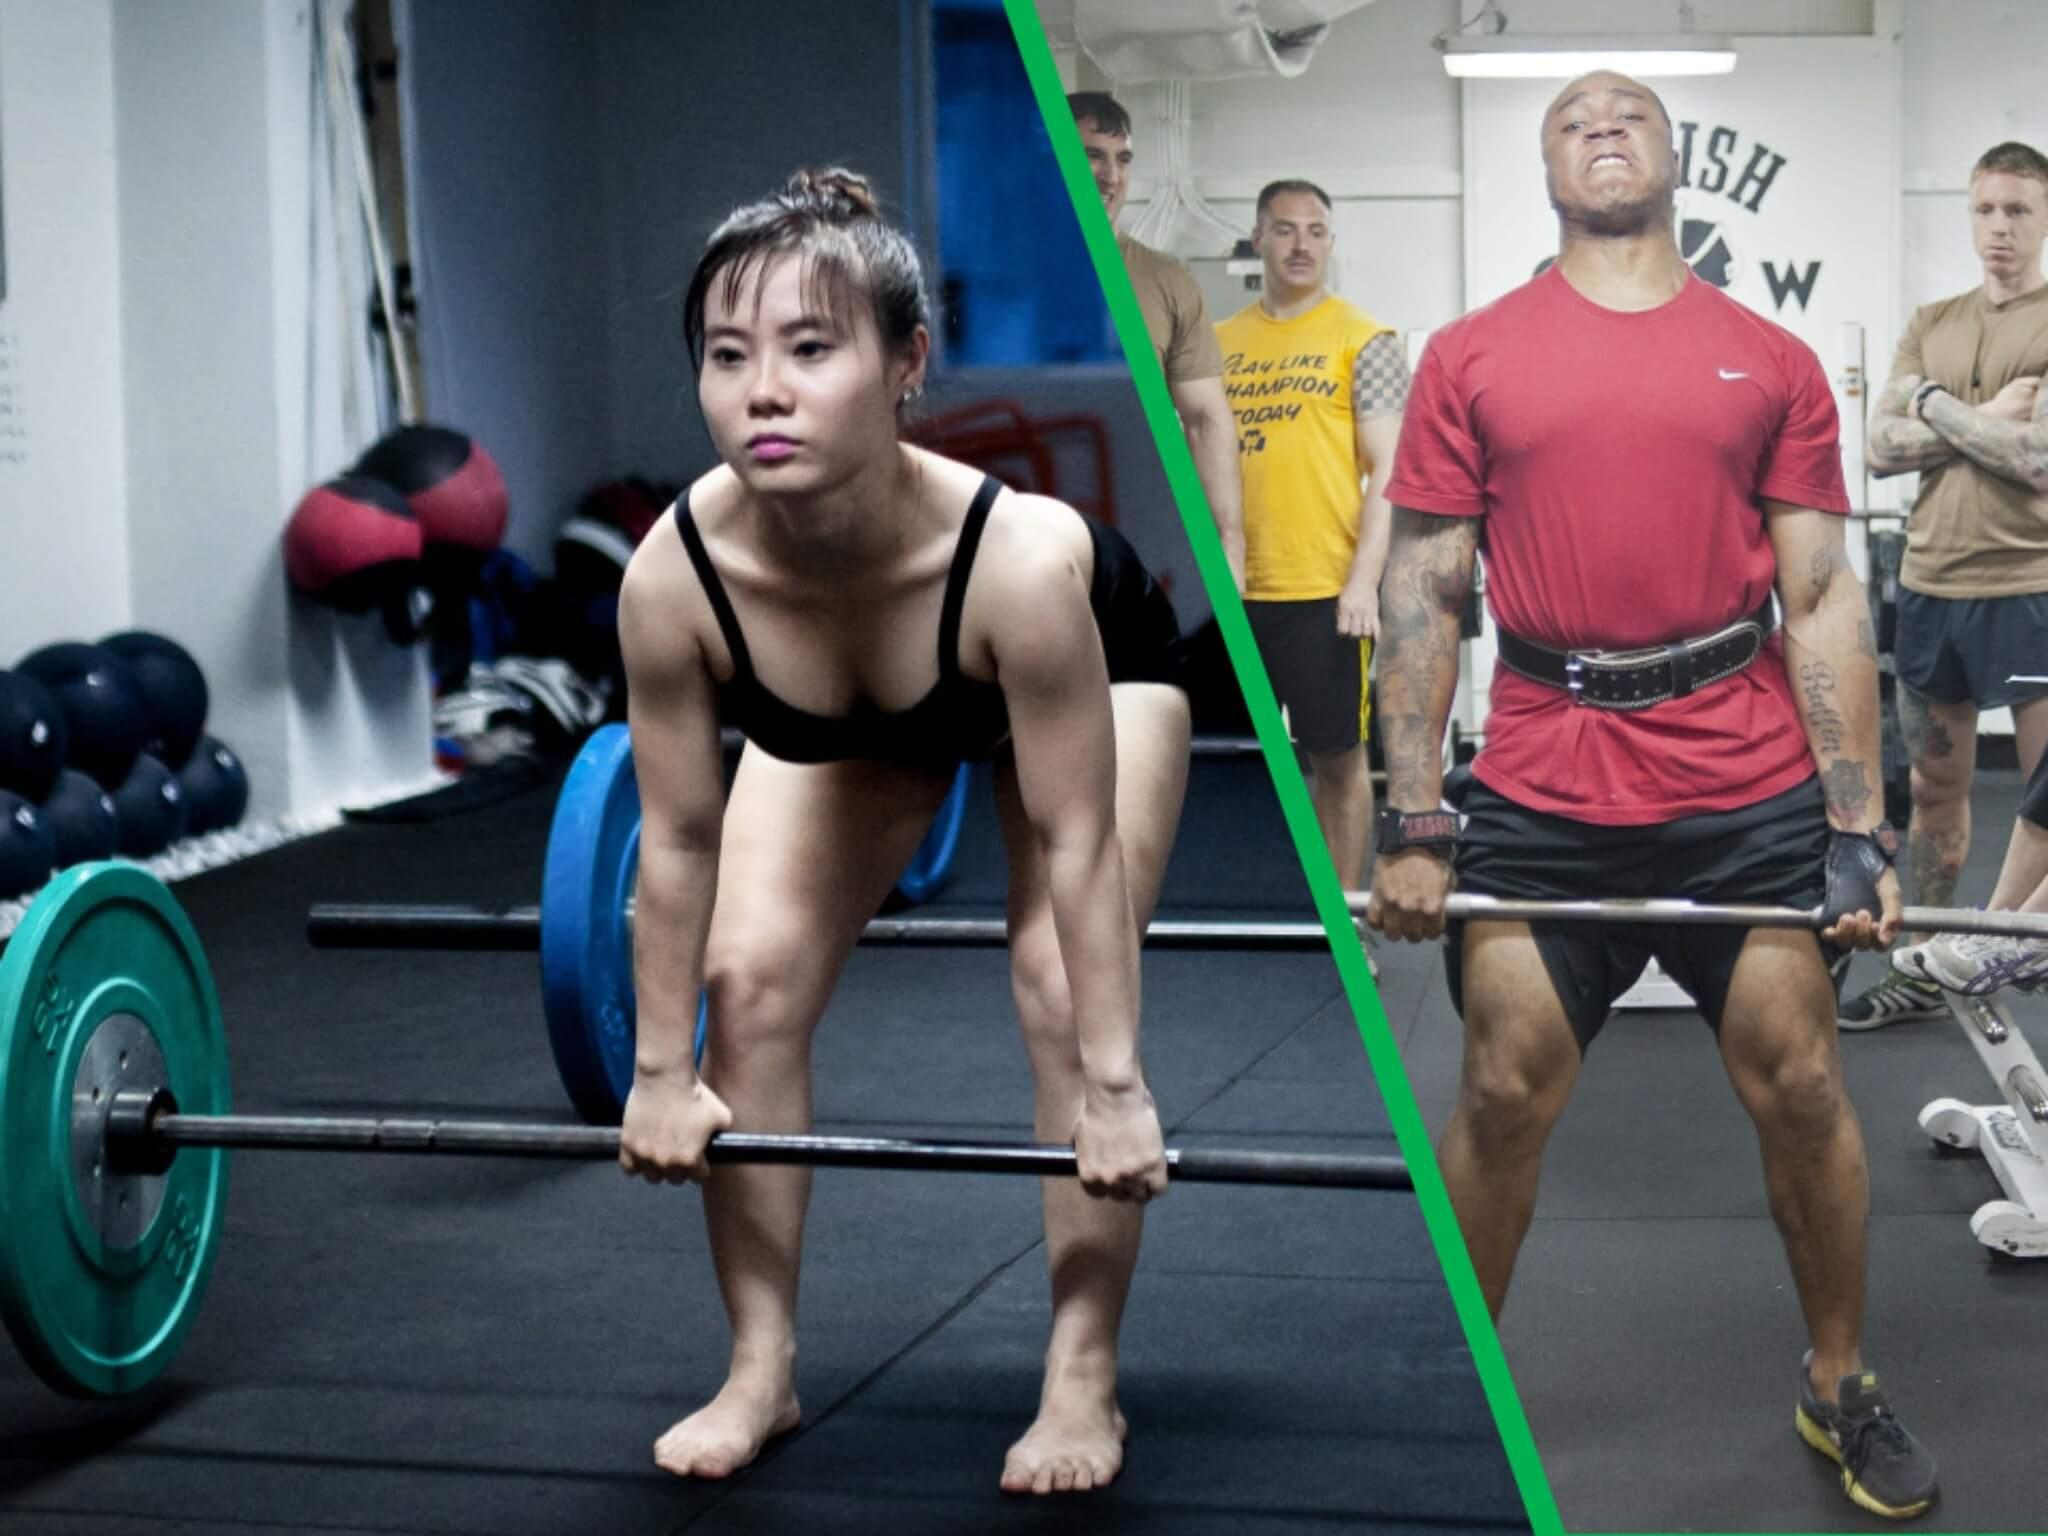 La scheda di powerlifting per l'allenamento di novembre